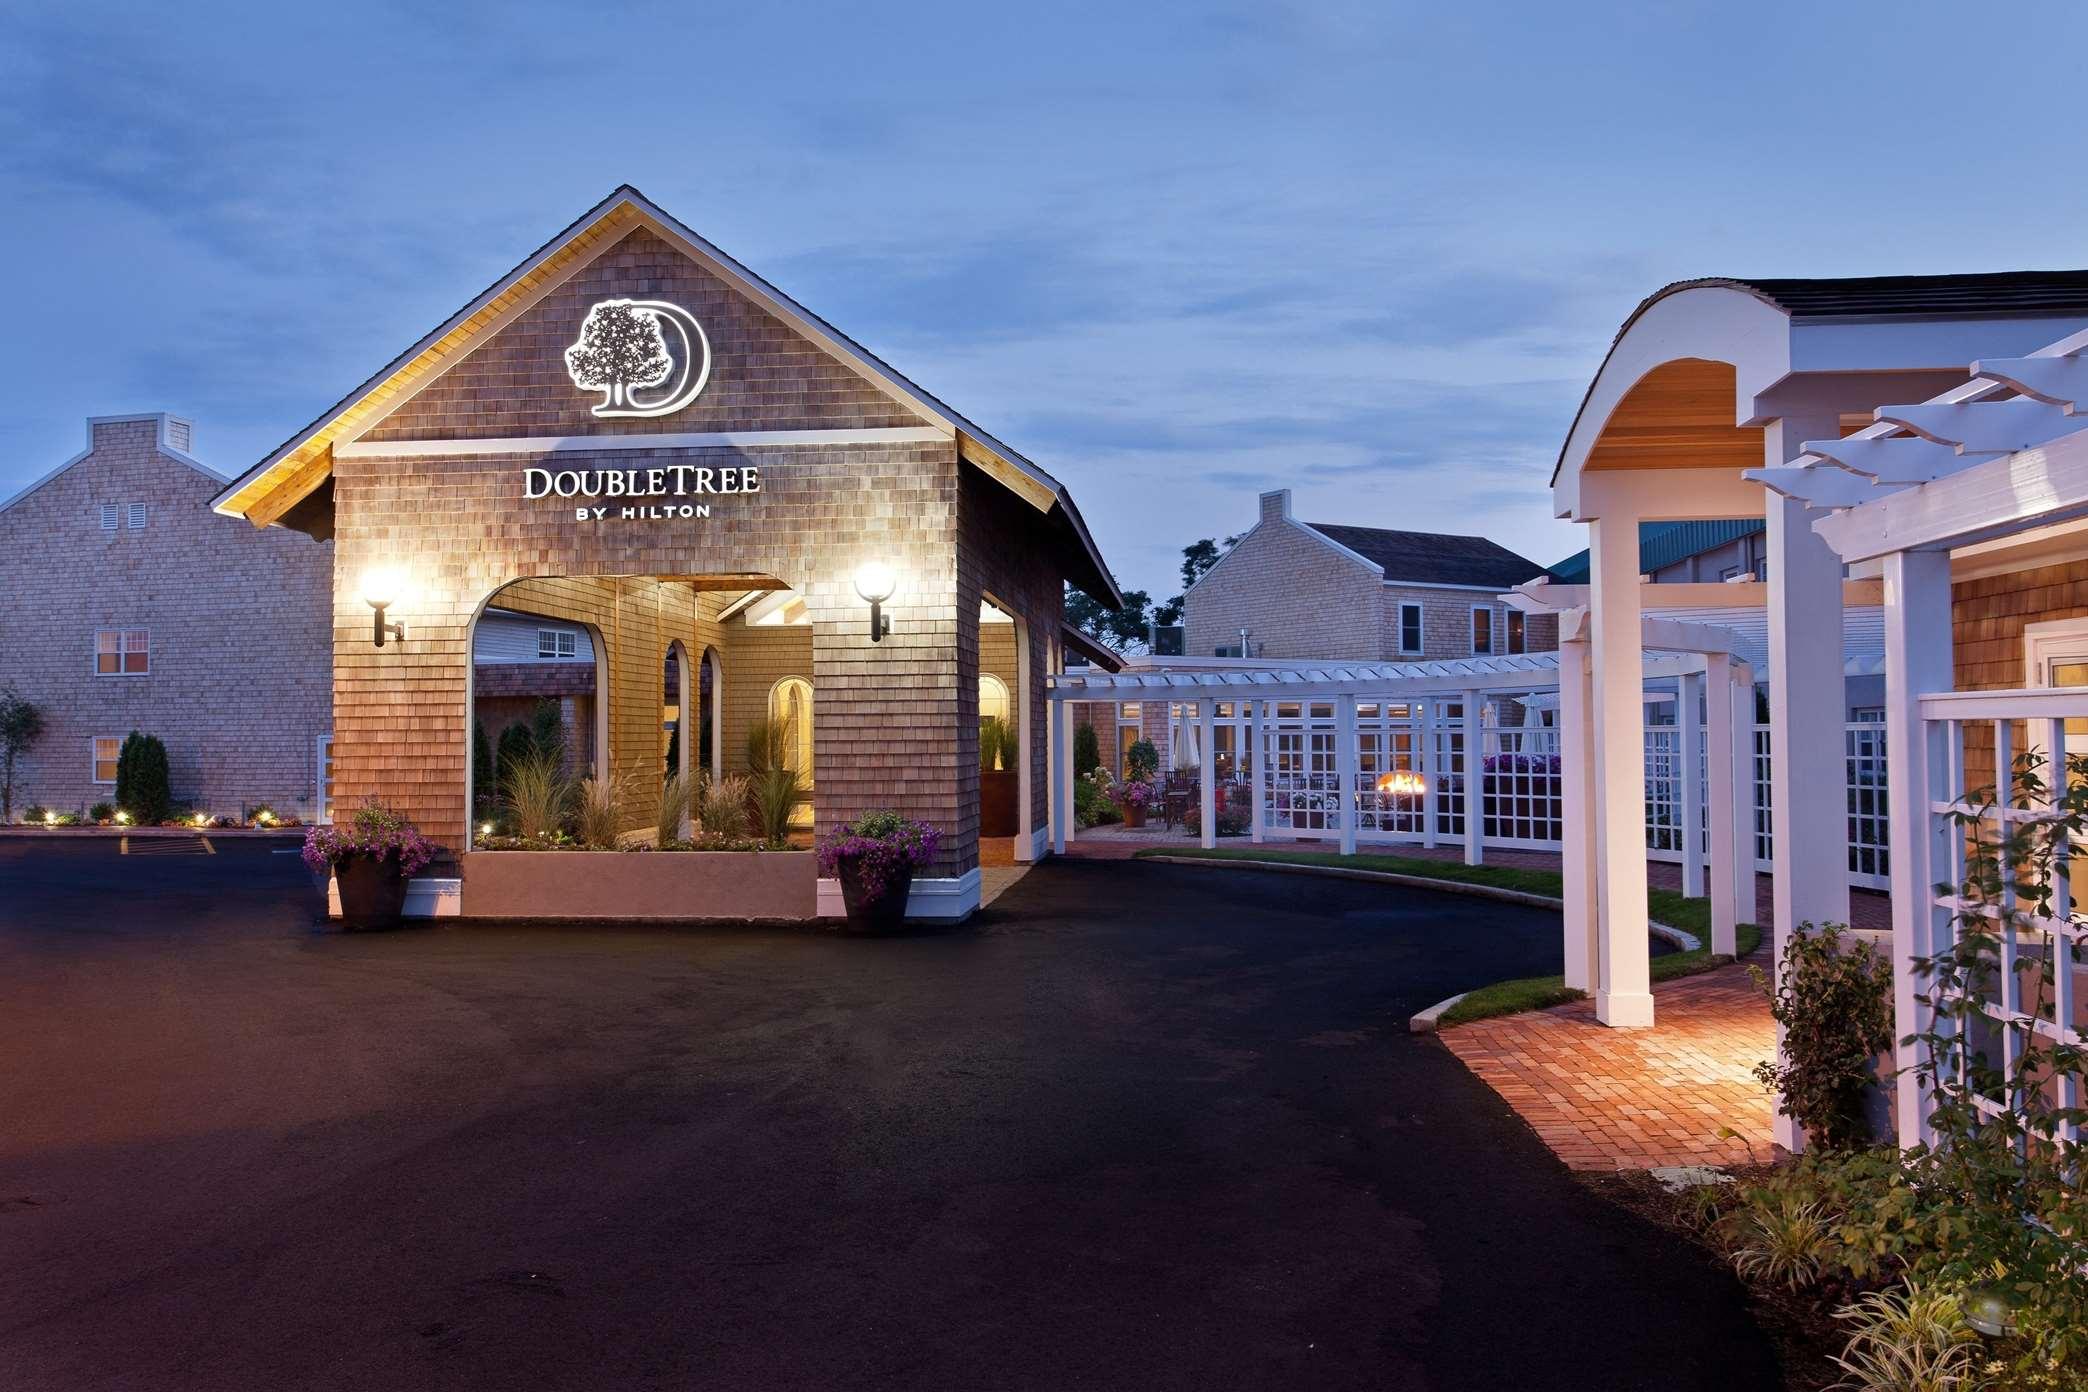 Doubletree By Hilton Hotel Cape Cod Hyannis Hyannis